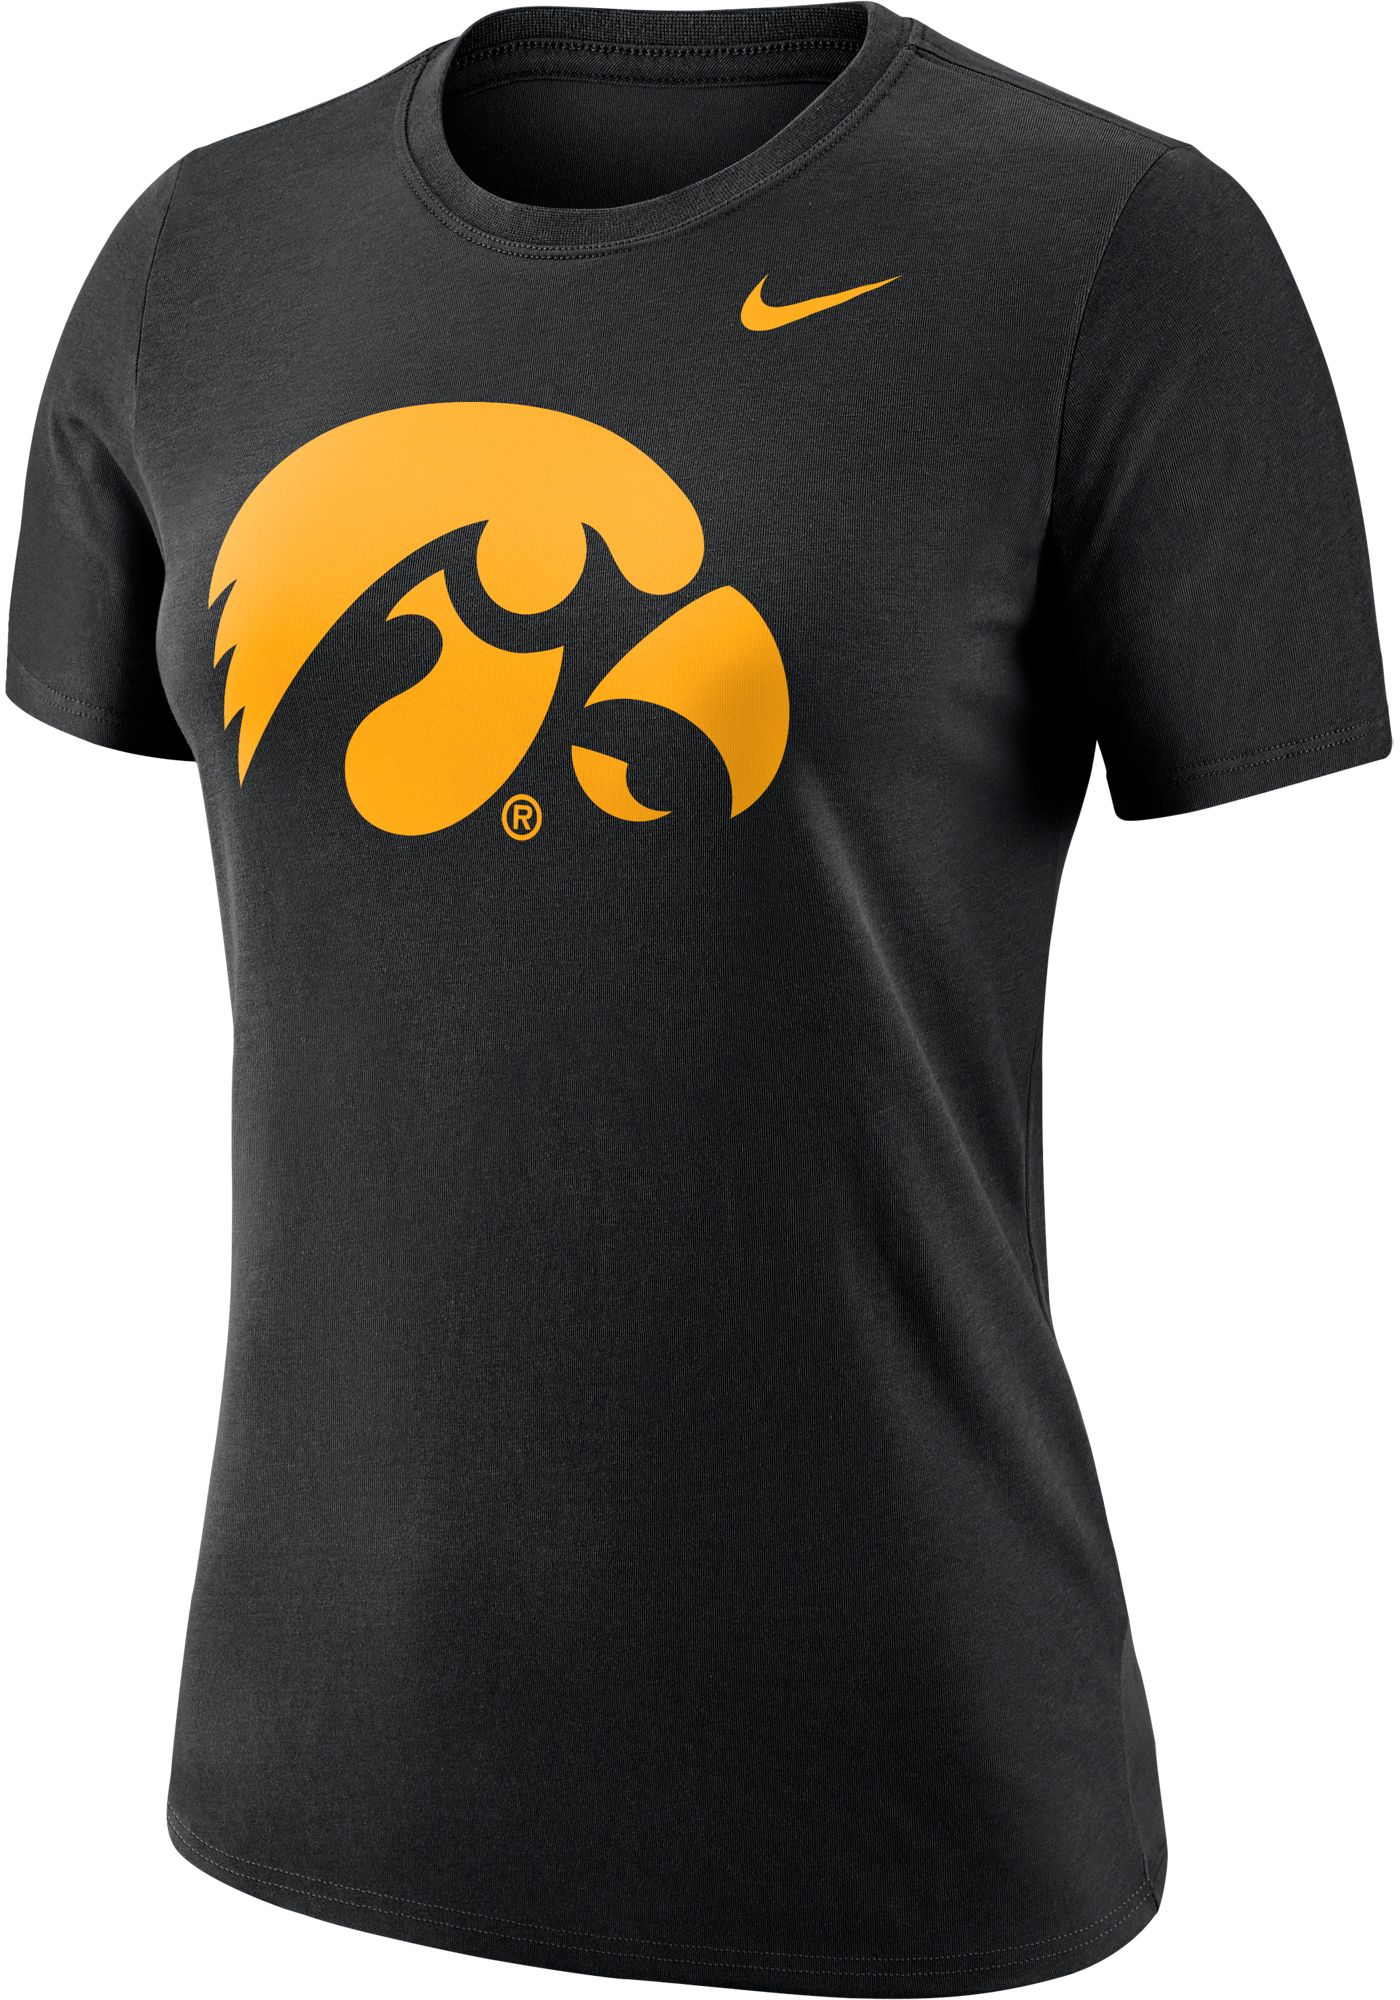 Nike Women's Iowa Hawkeyes Dri-FIT Logo Crew Black T-Shirt